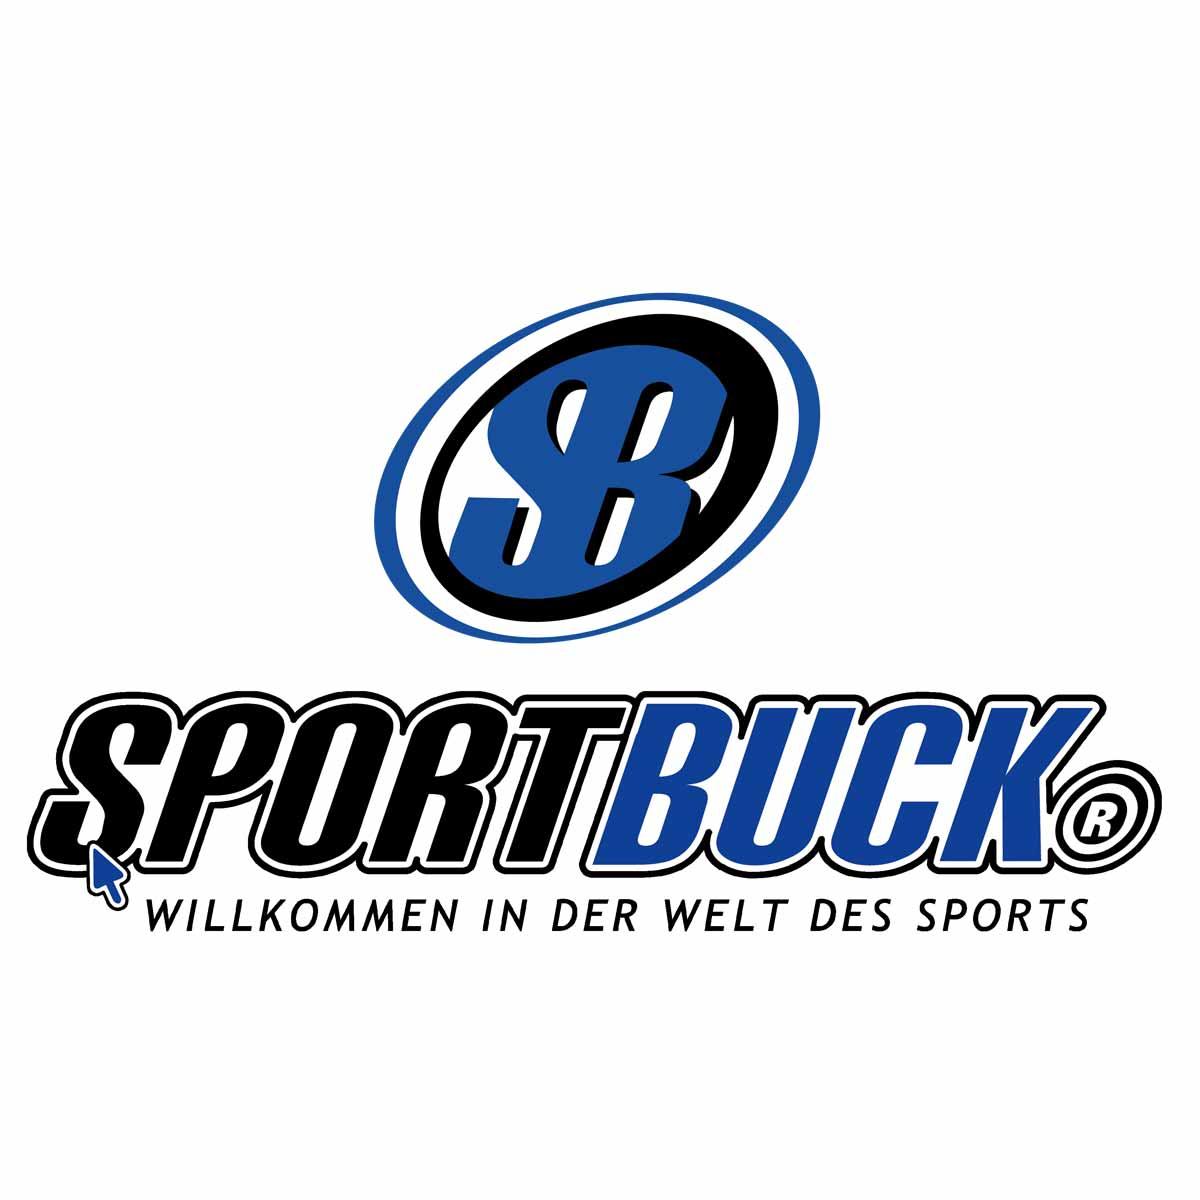 Sportbuck Logo